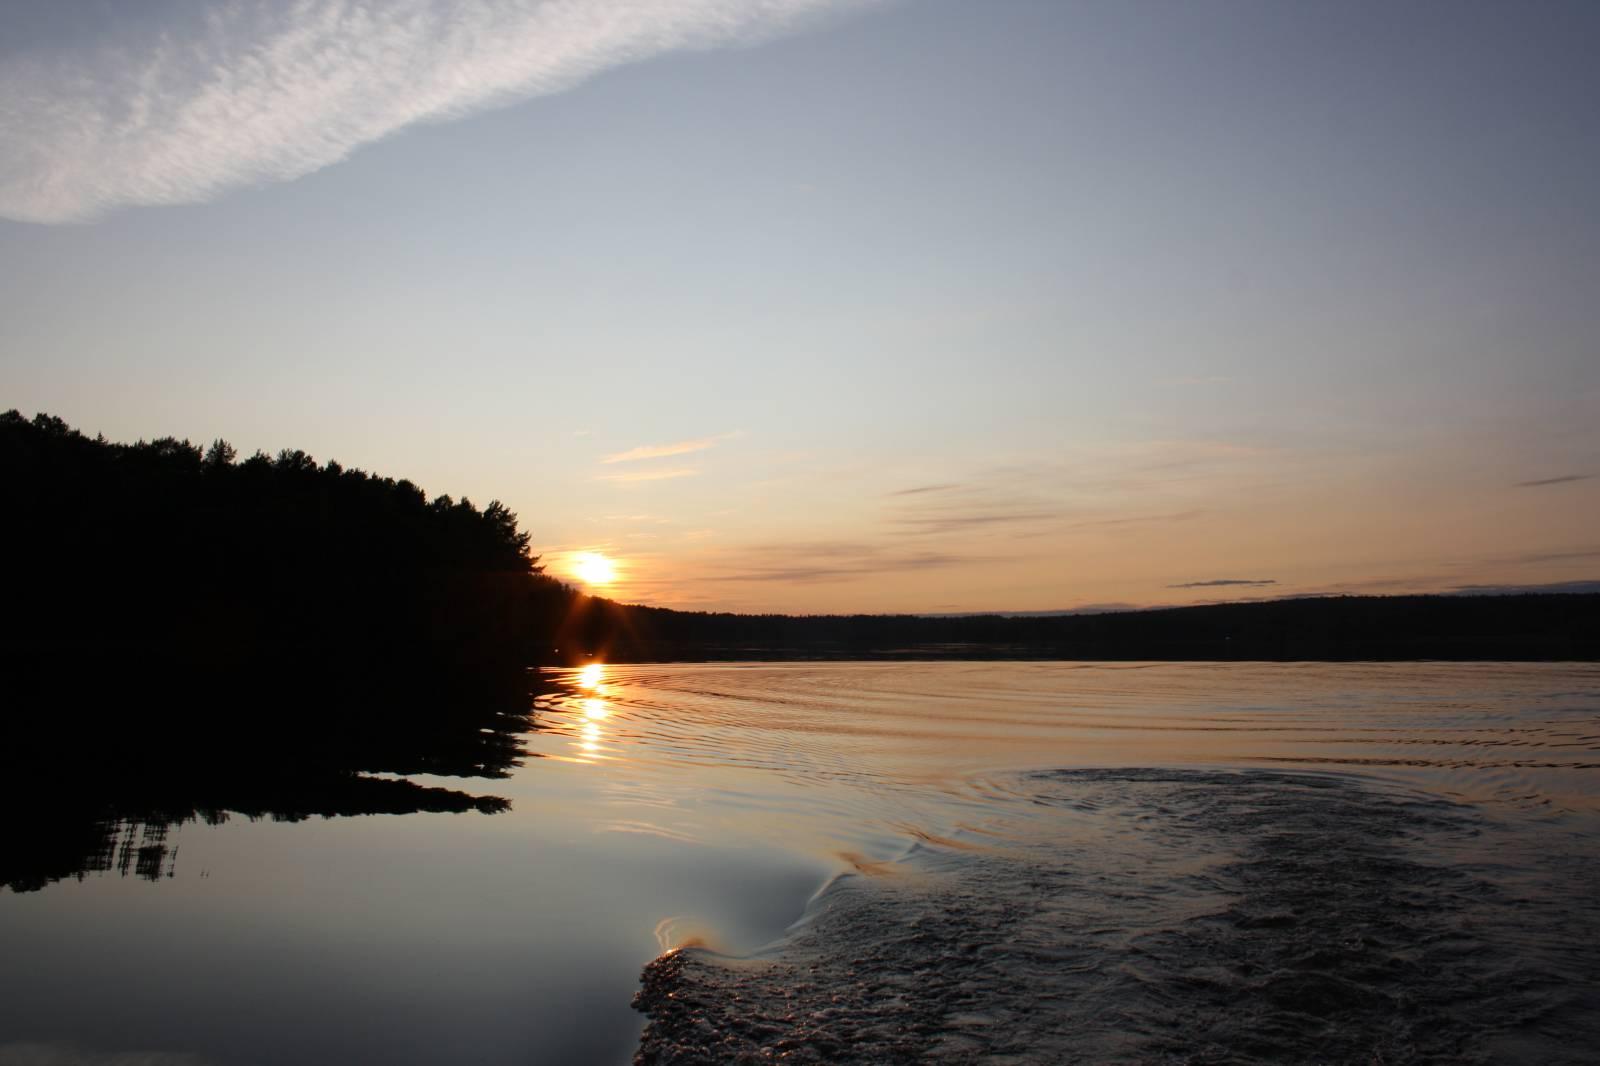 карелия отдых летом 2016 цены рыбалка